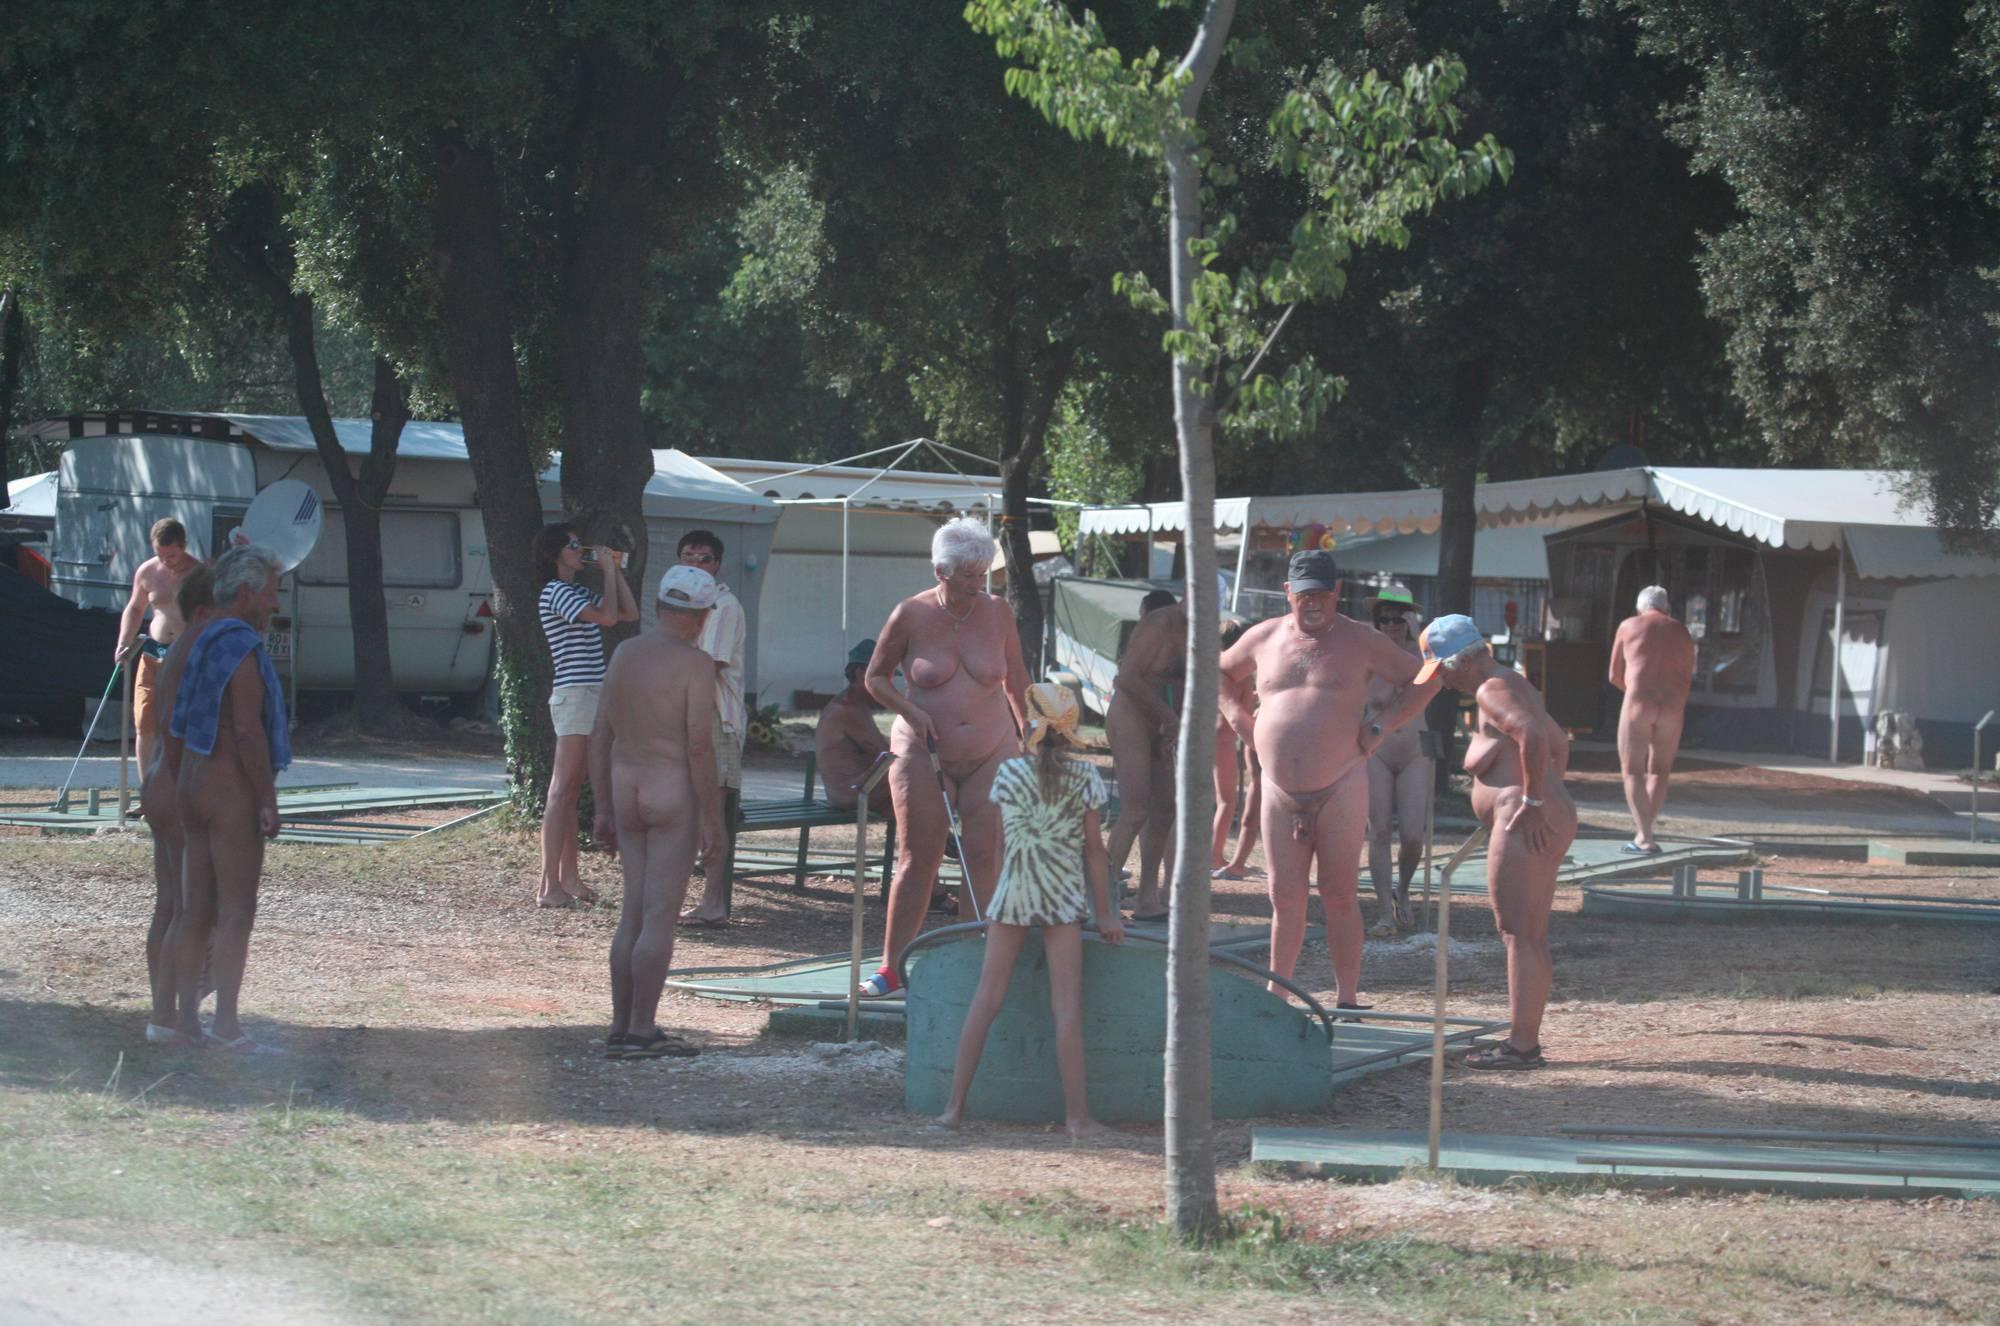 Nudist Gallery Nora FKK Miniature Golf - 2